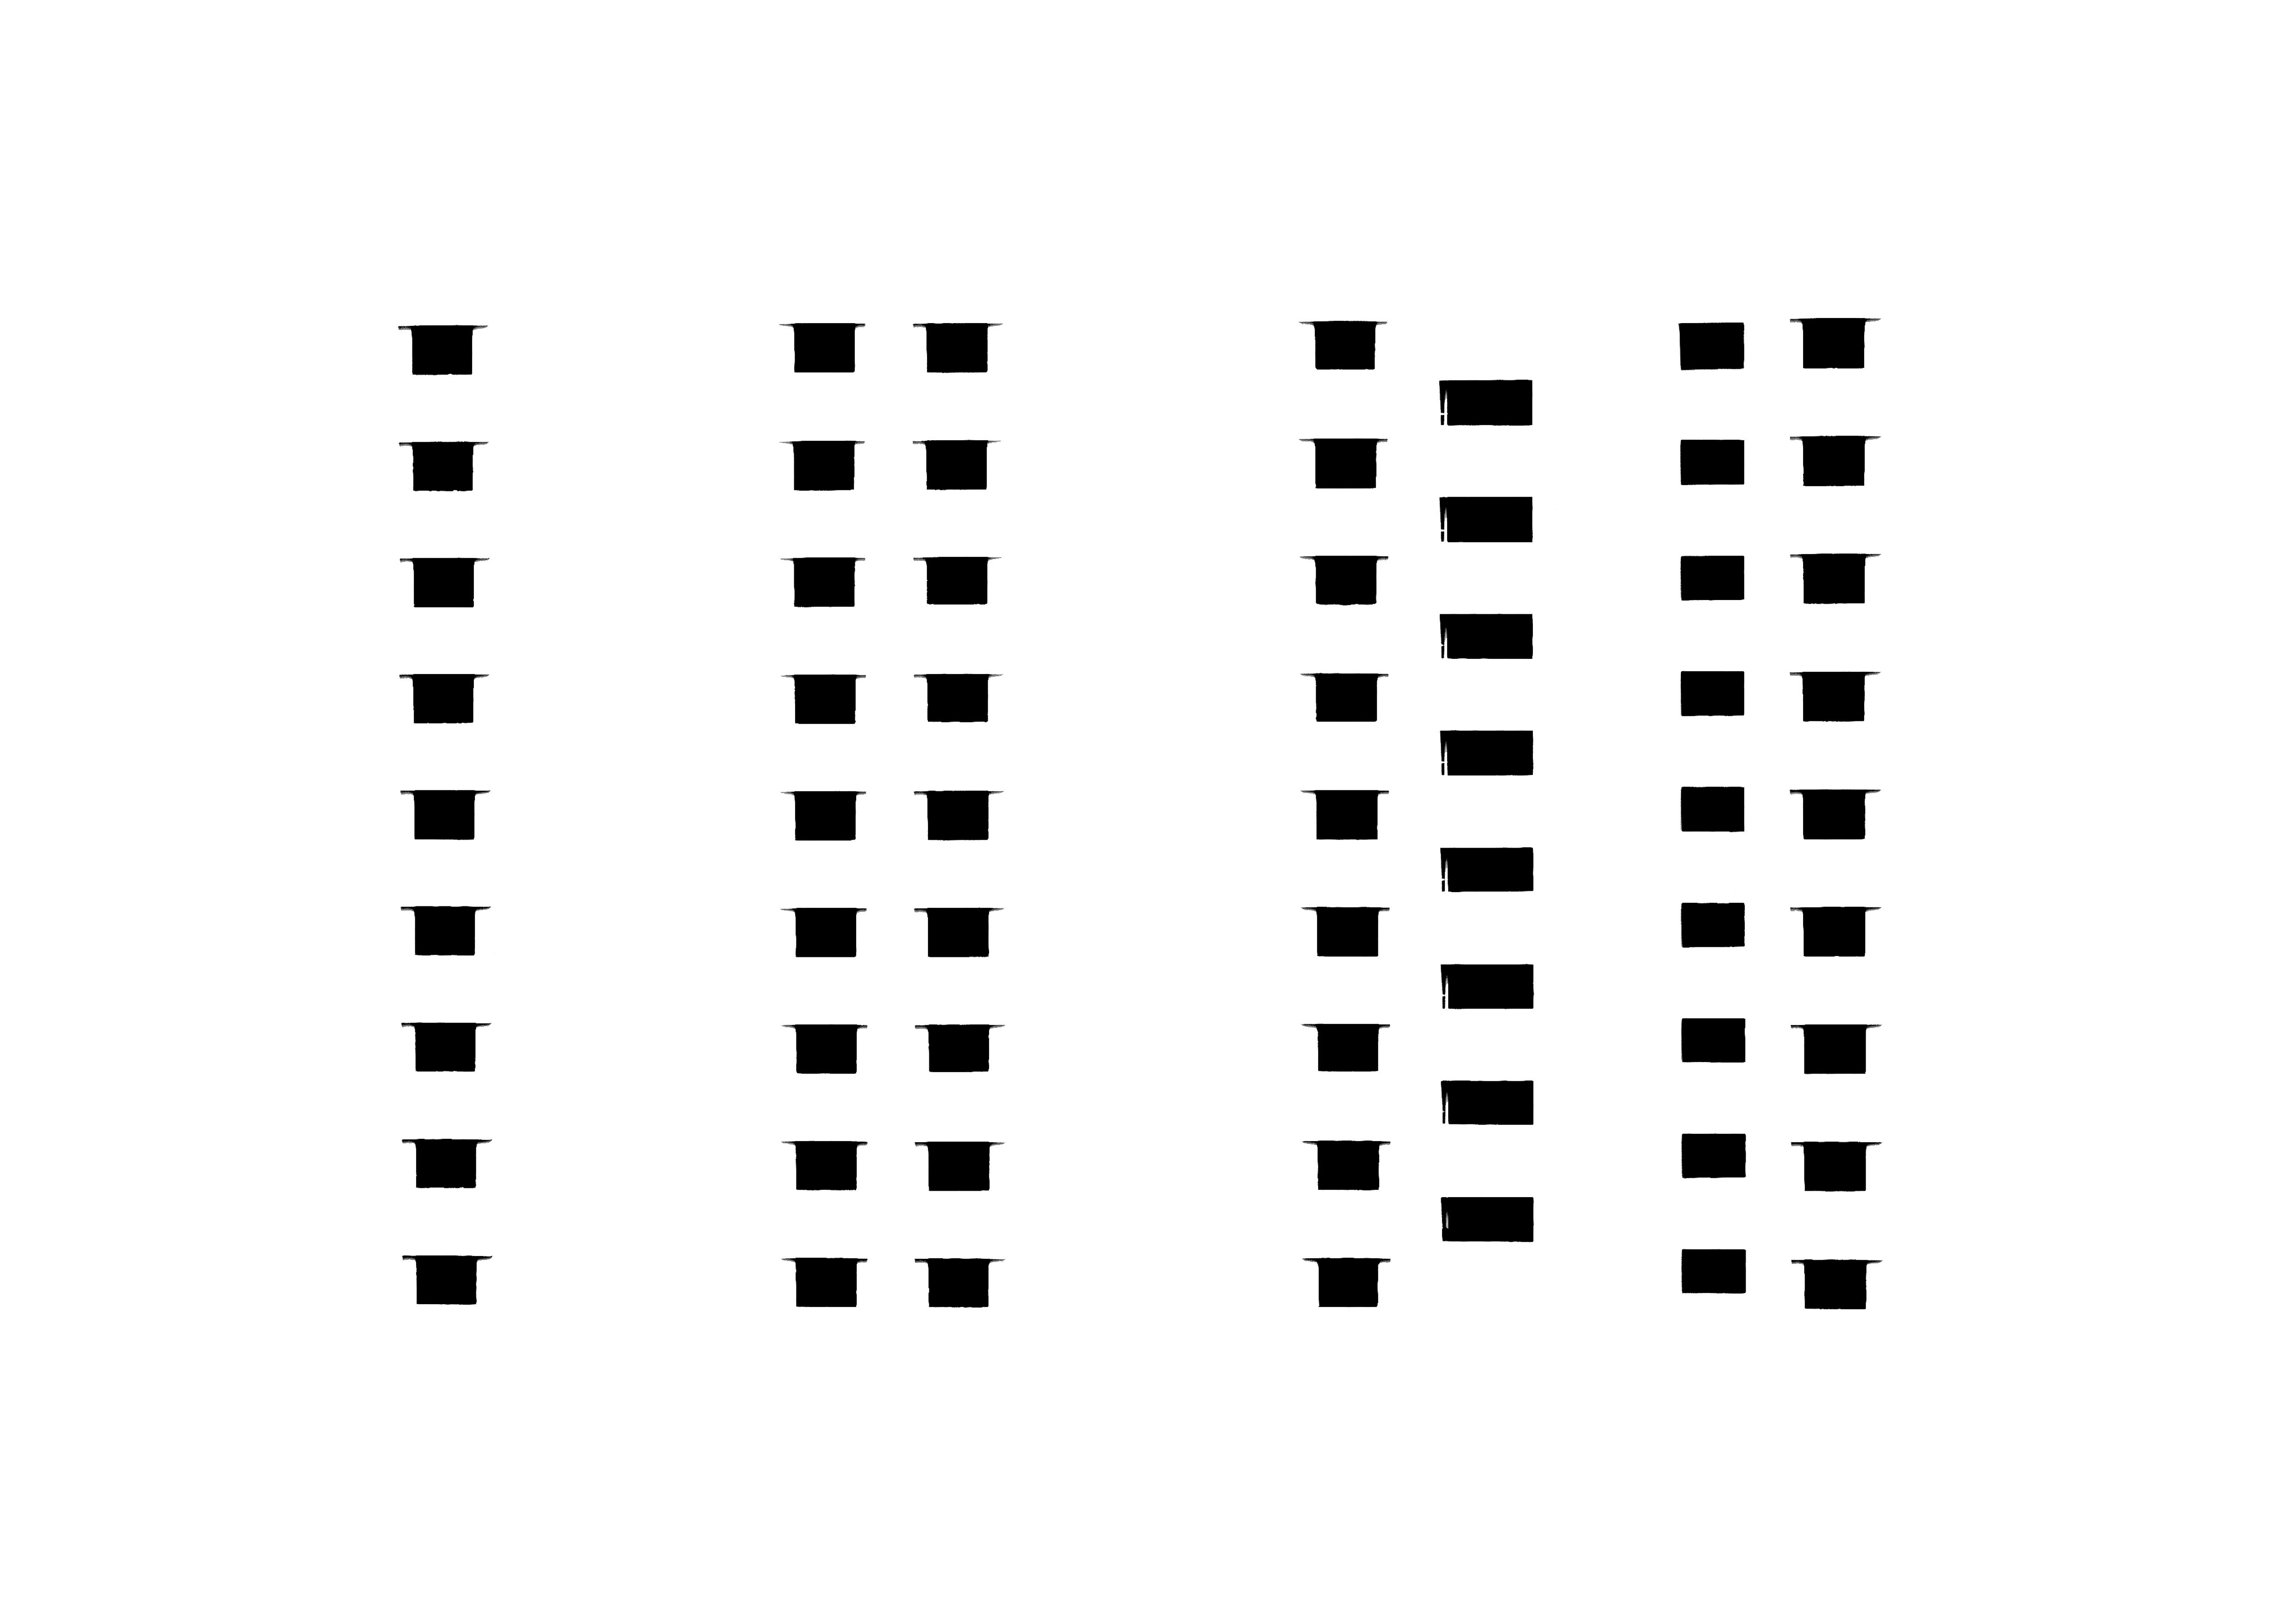 Black Boxes-1